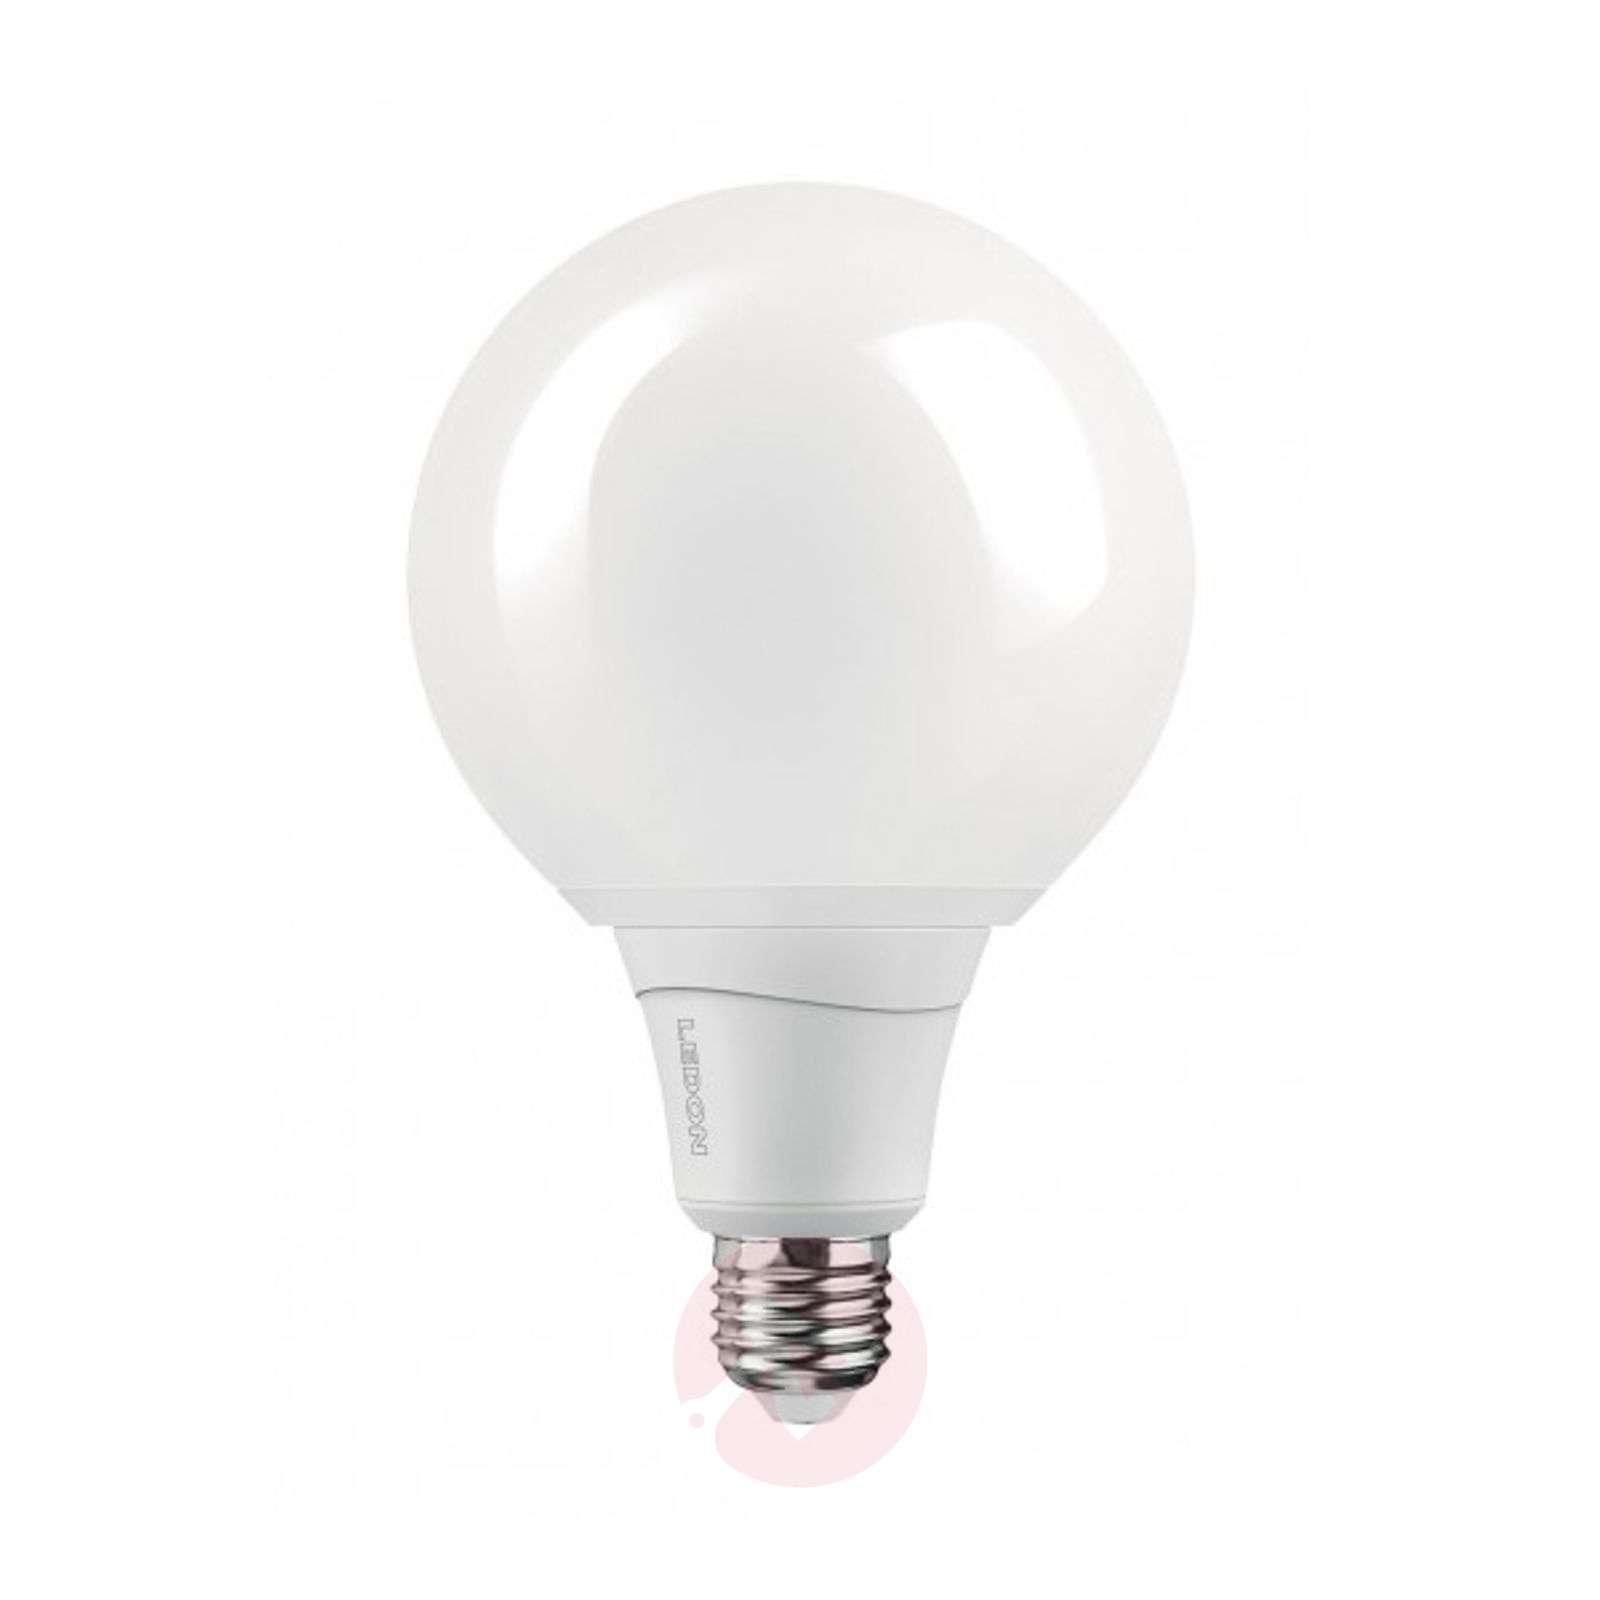 E27 10W 820/827 LED-hehkulamppu G120 color relax-6037119-01